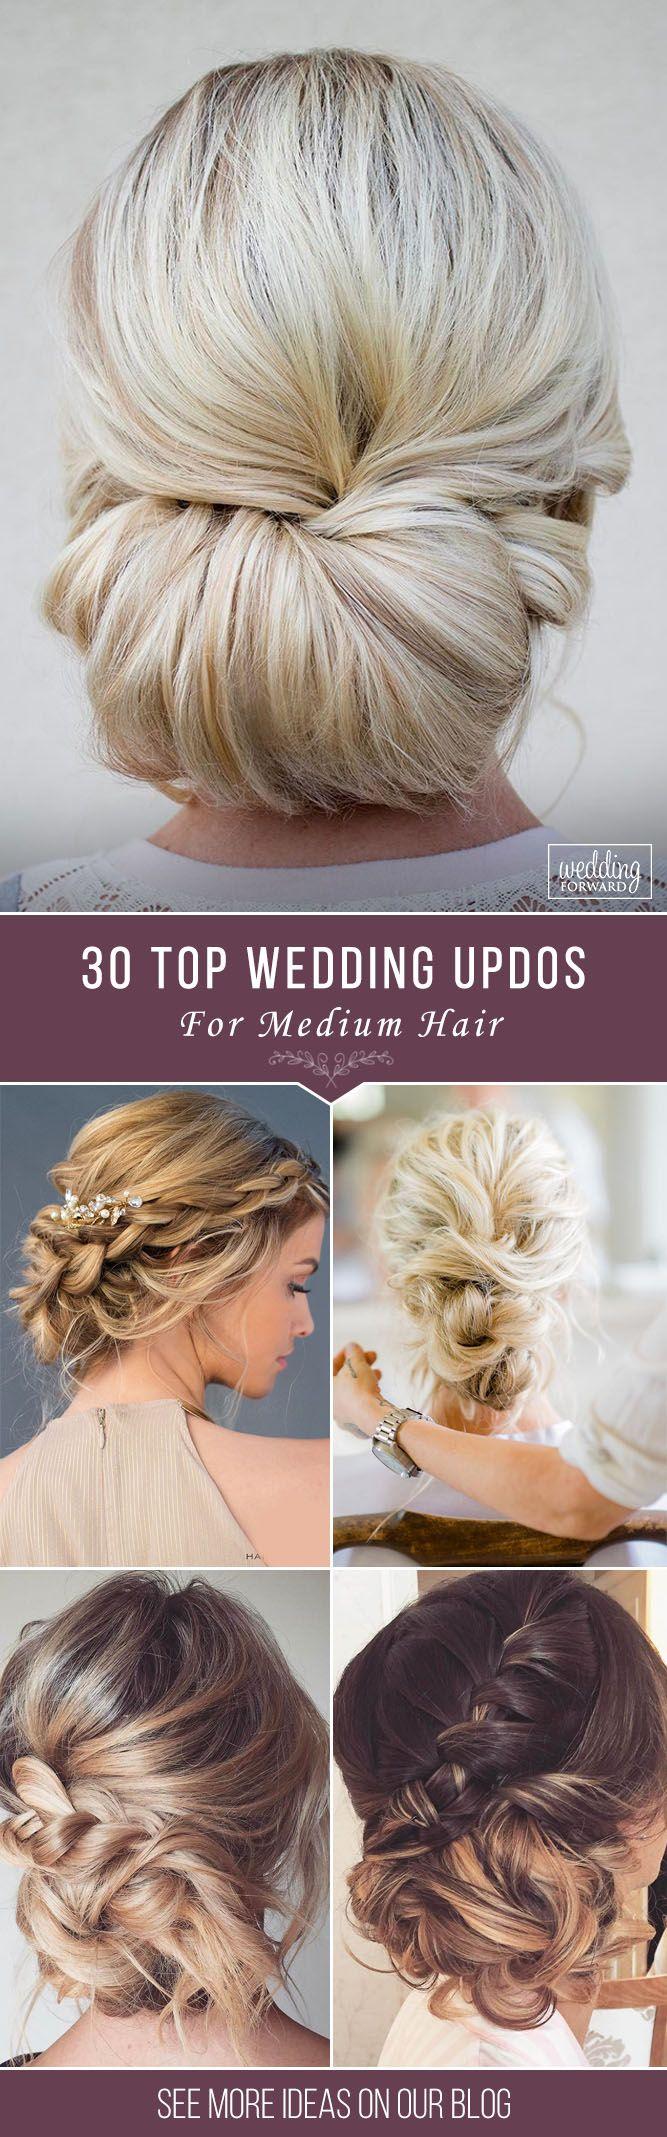 30 Top Wedding Updos For Medium Hair ❤ Wedding updos for medium hair will be o...